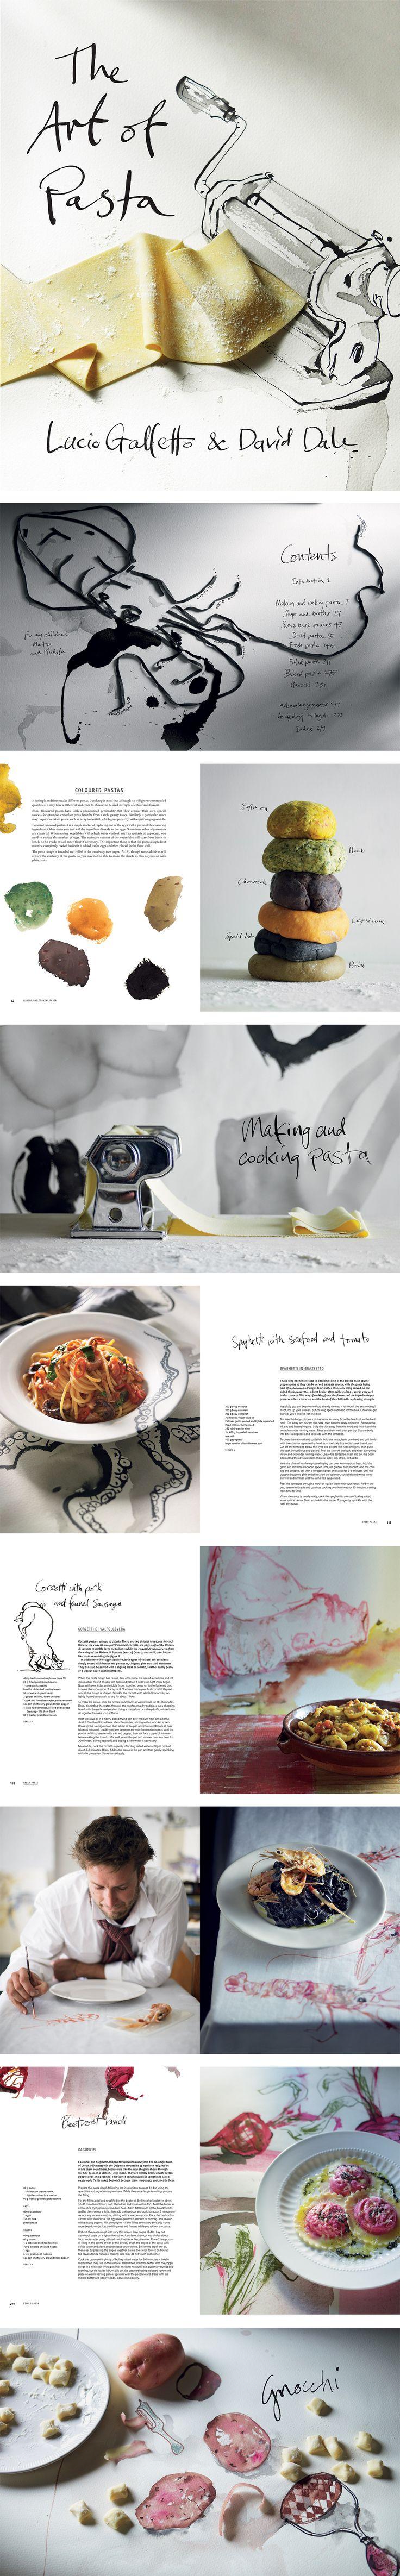 The Art of Pasta – Lucio Galletto and David Dale / Designed by Daniel New / Illustration by Luke Sciberras / Photography by Anson Smart / Penguin/Lantern / Cookbook / Book Design / Cover